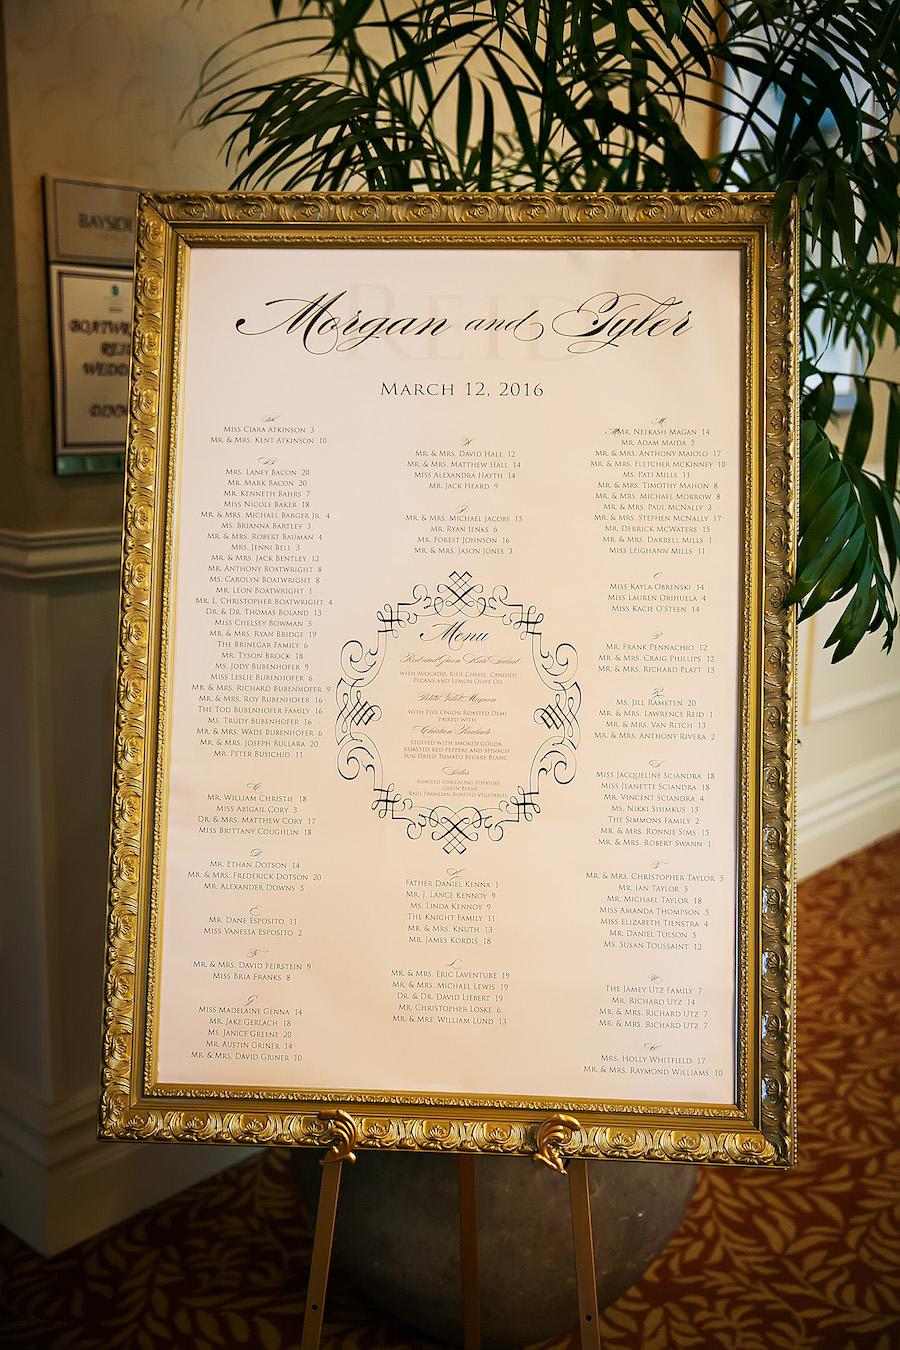 Elegant Wedding Reception Guest Seating Chart in Ornate Gold Frame